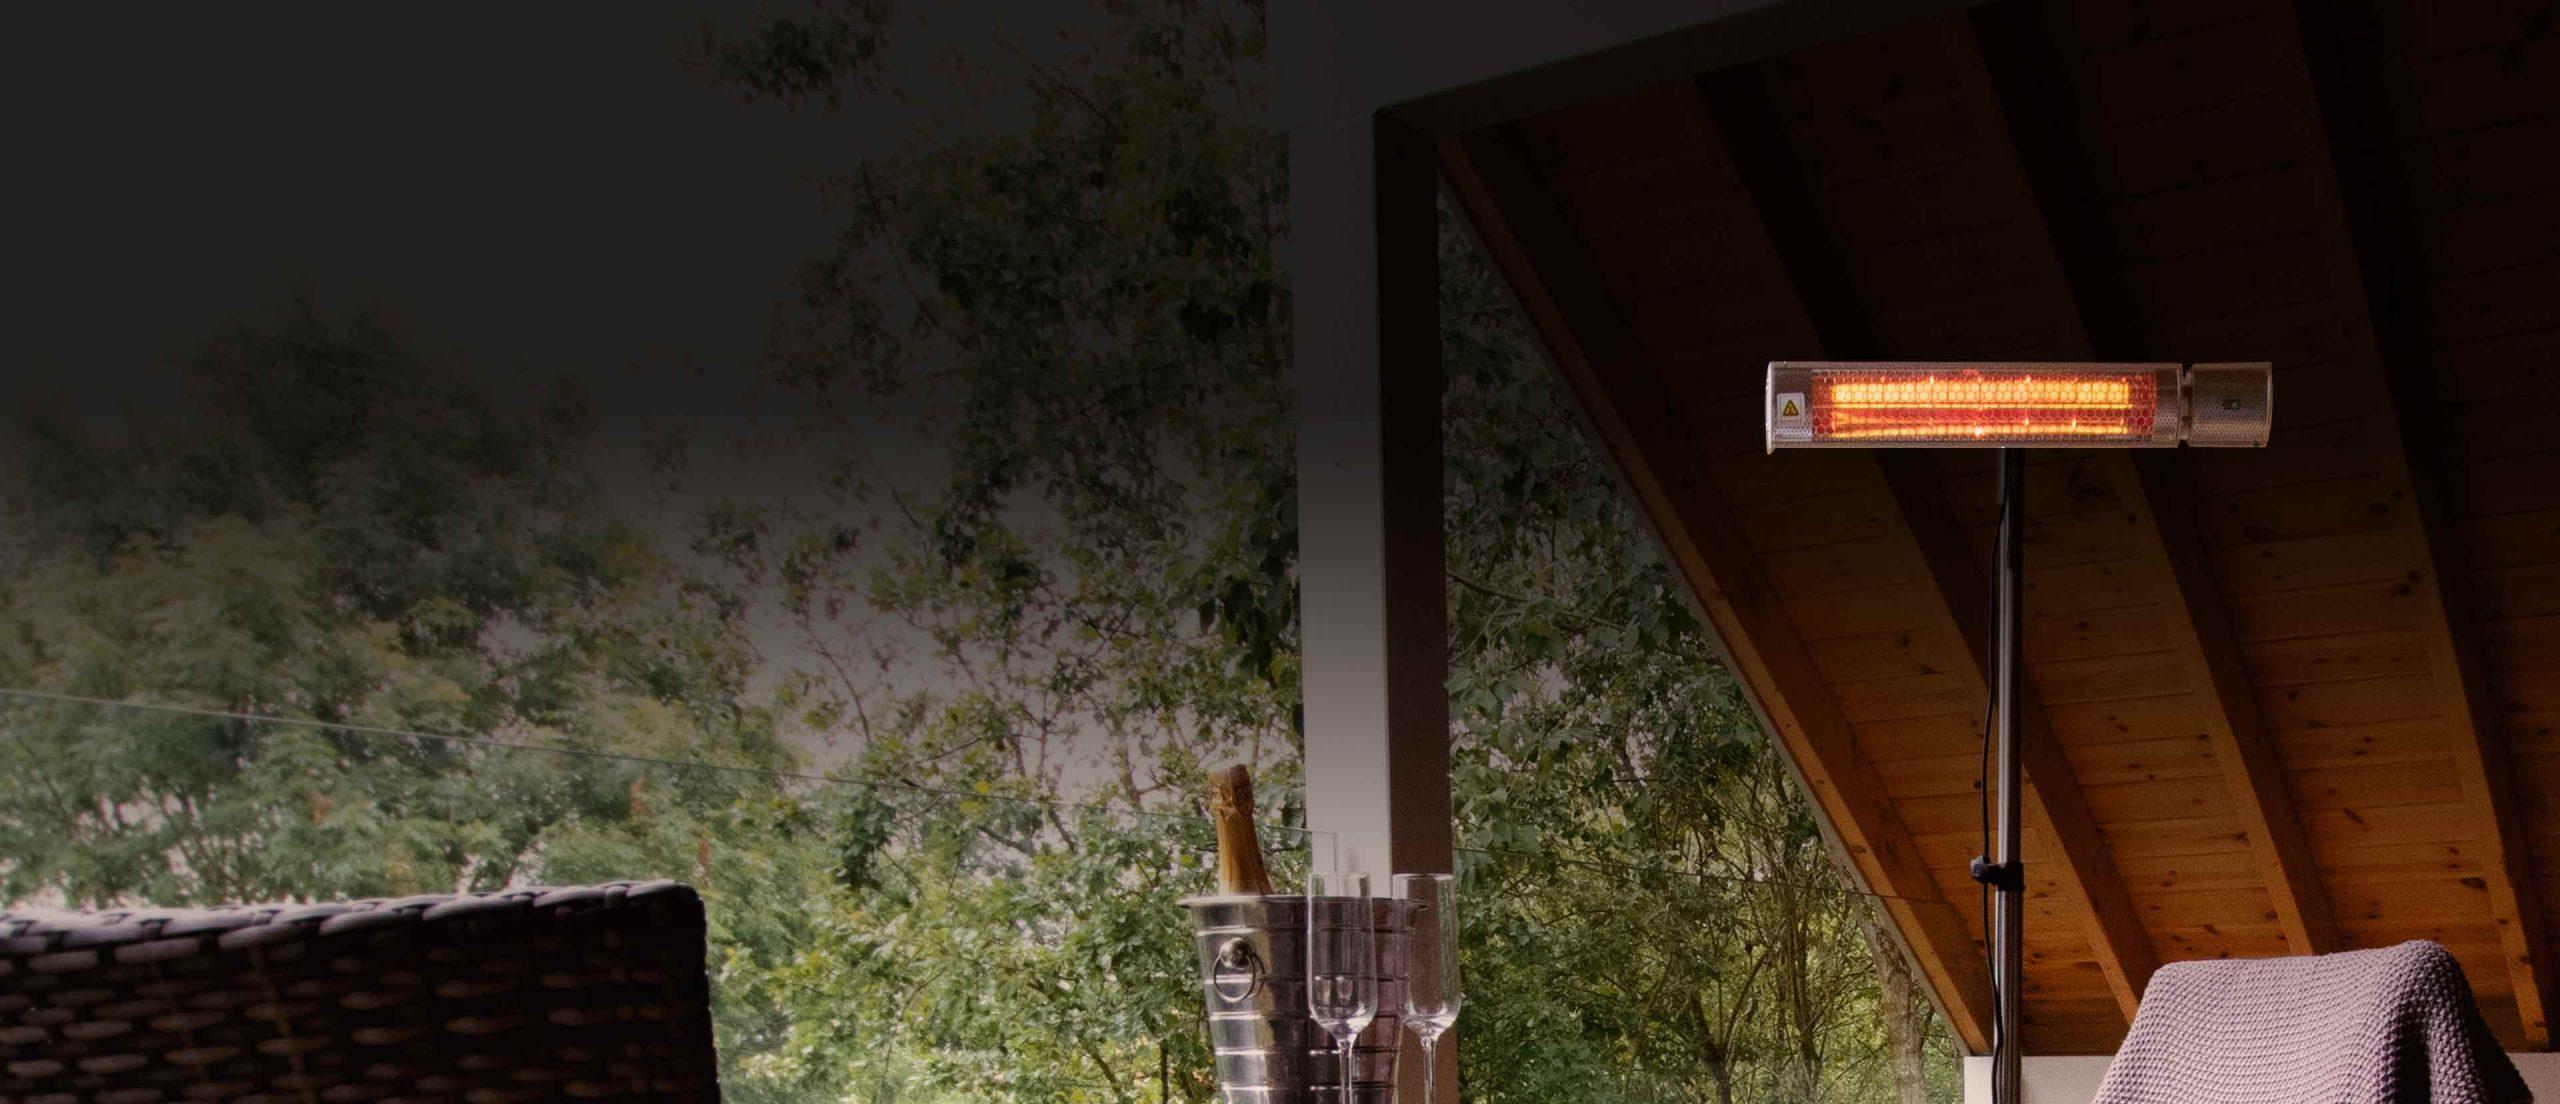 ecostrad sunglo electric patio heater